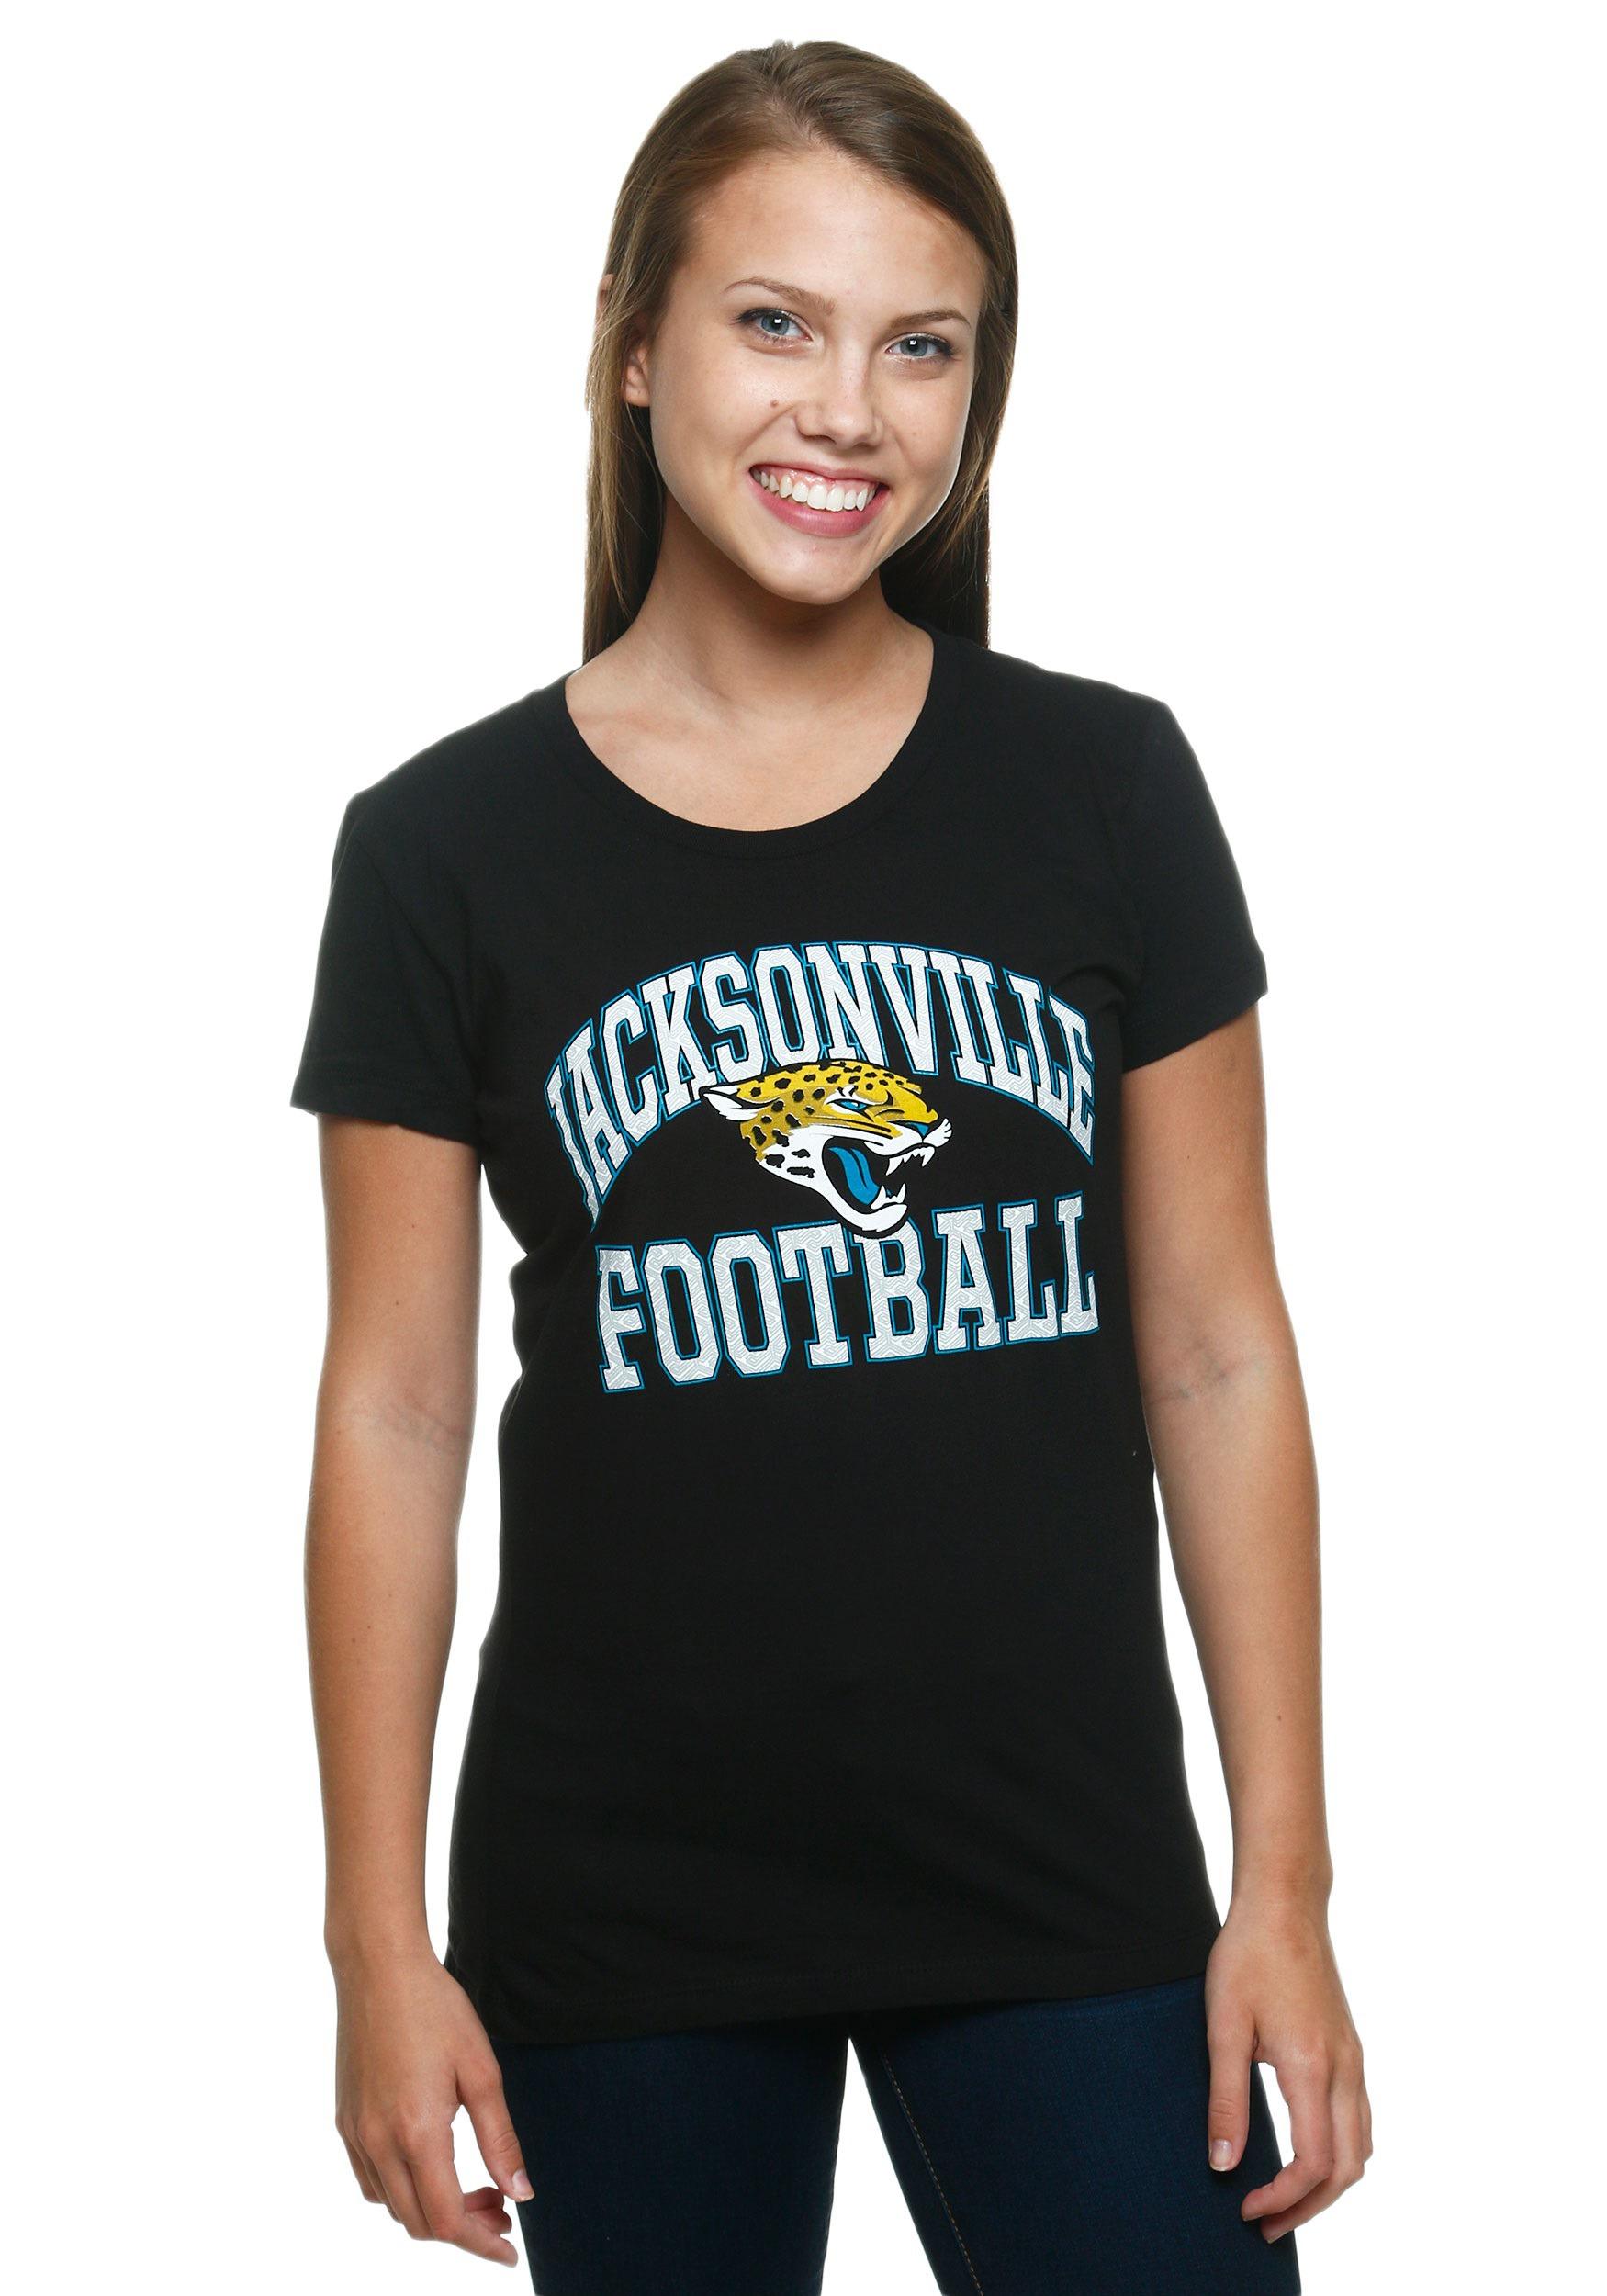 jacksonville-jaguars-franchise-fit-womens-t-shirt.jpg 1f00a55f5